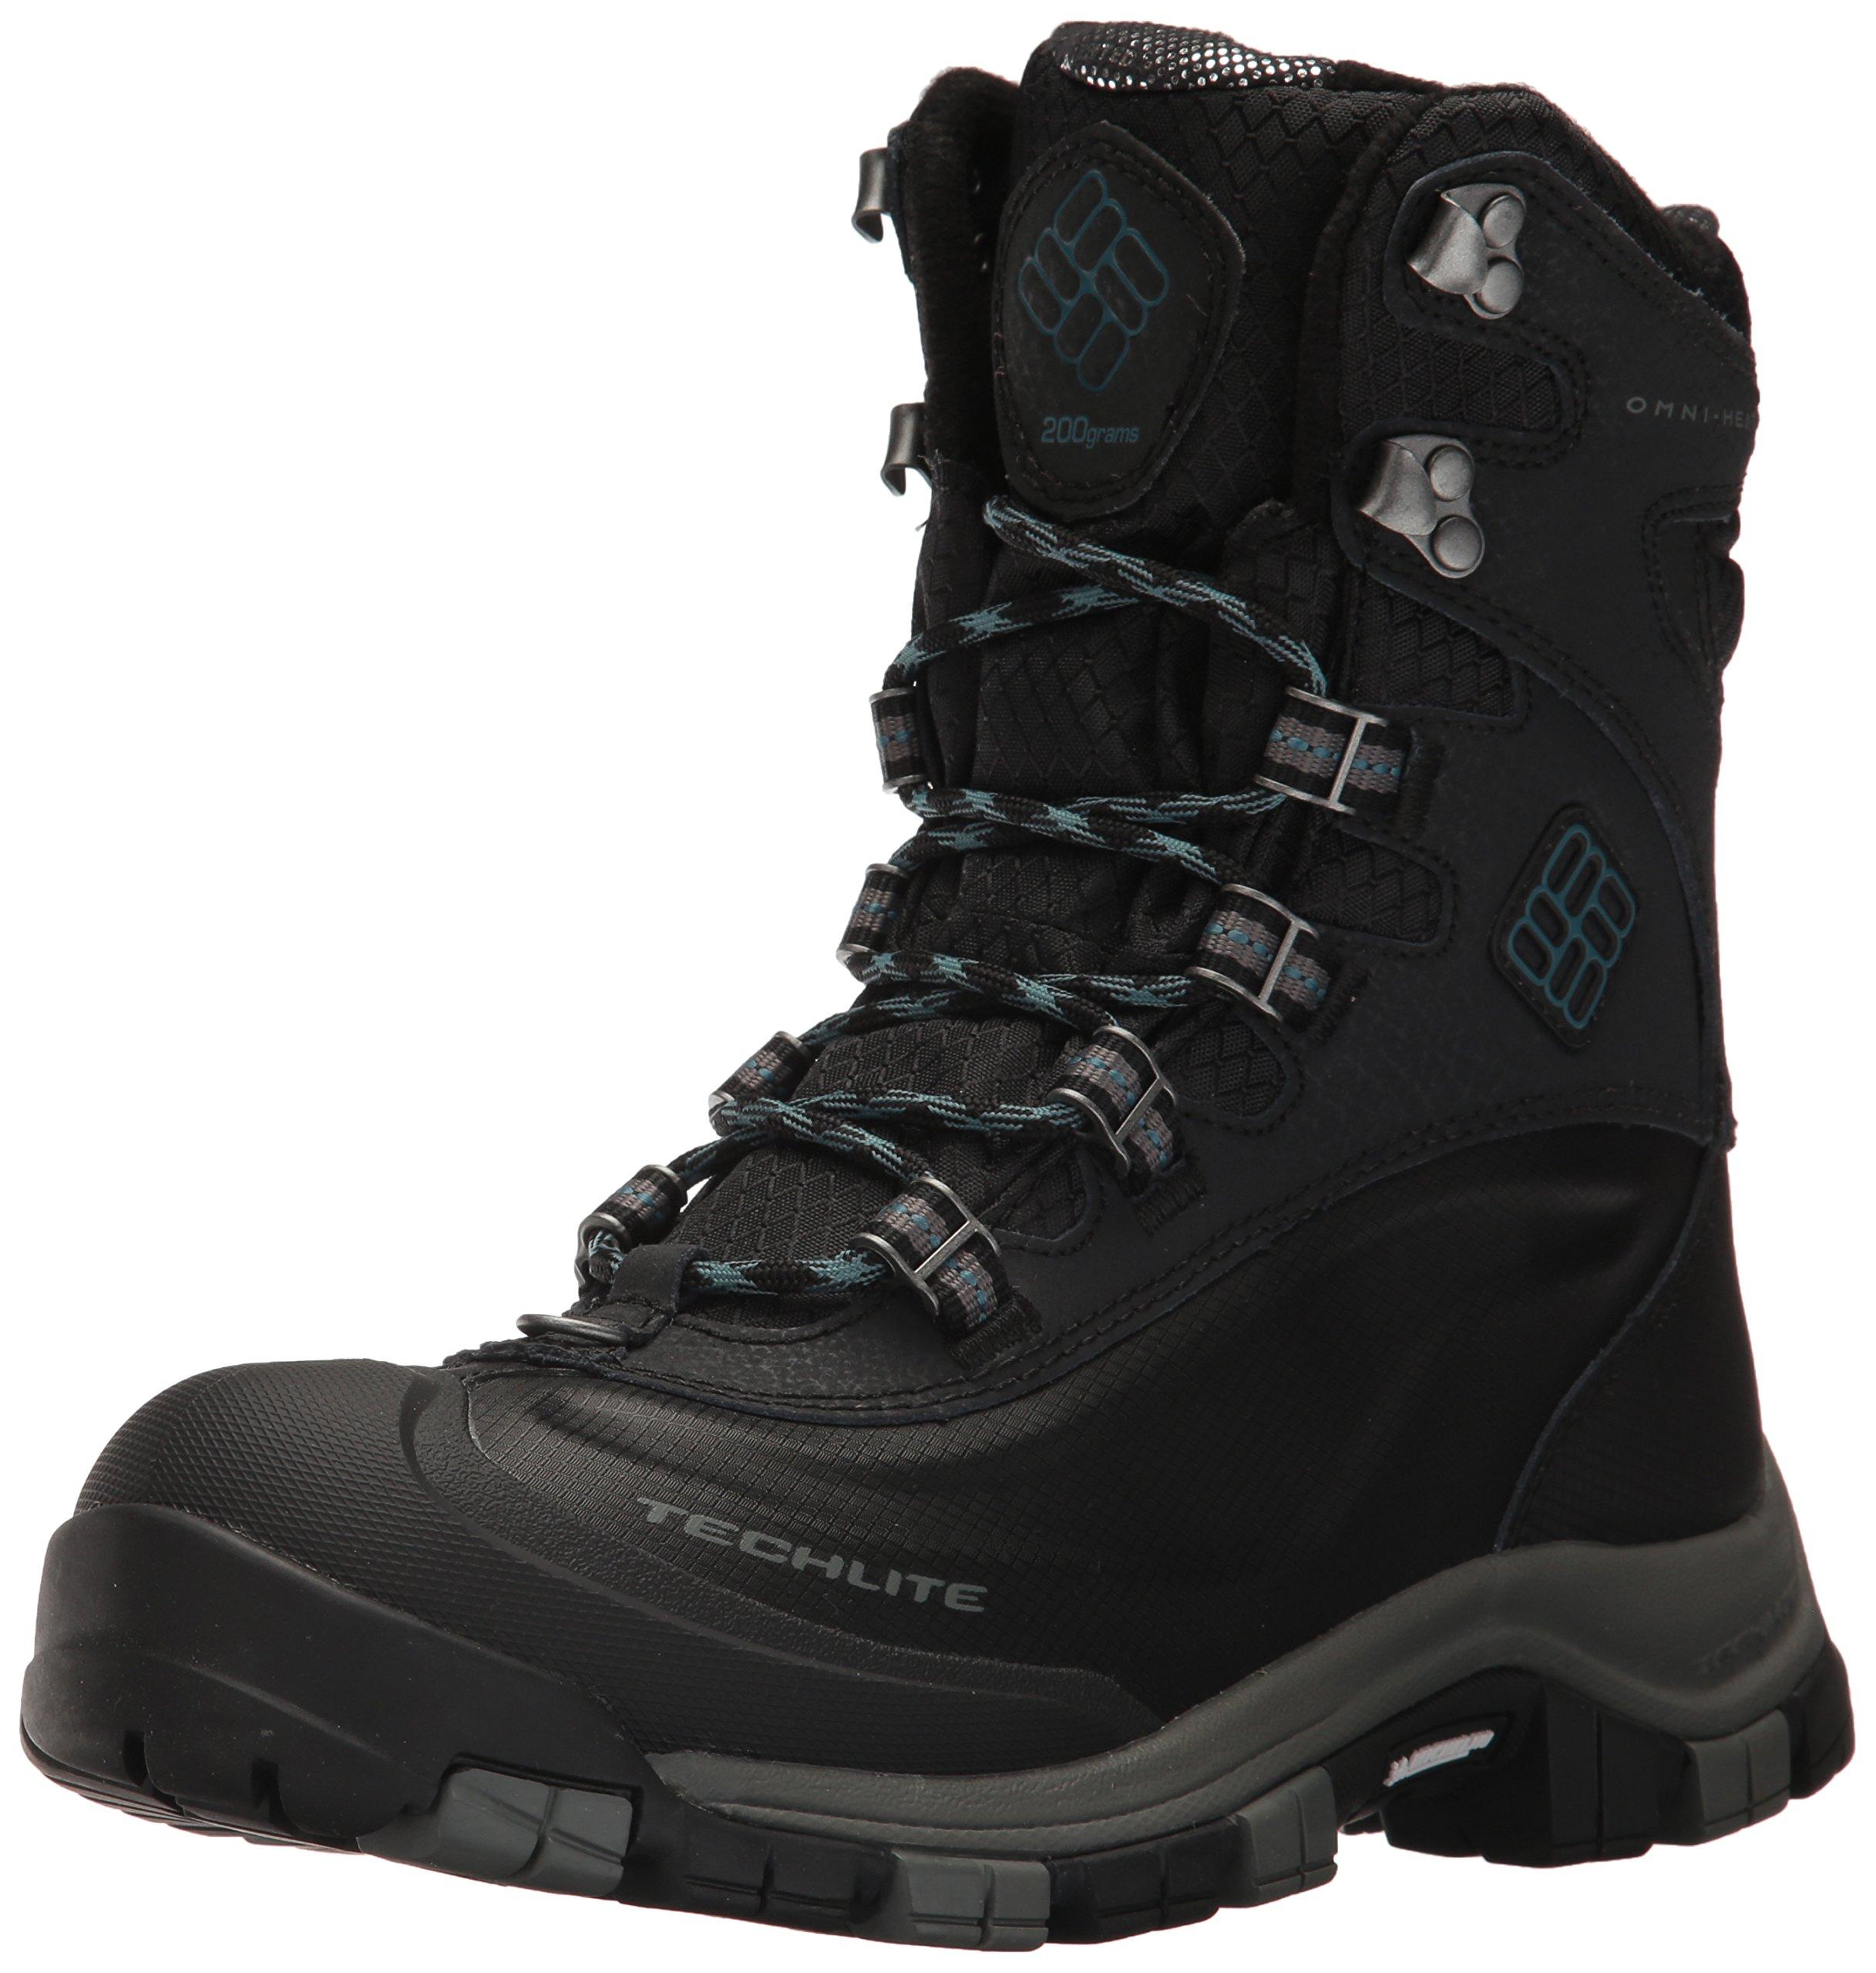 Columbia Women's Bugaboot Plus Omni-Heat Michelin Snow Boot, Black, Cloudburst, 9 B US